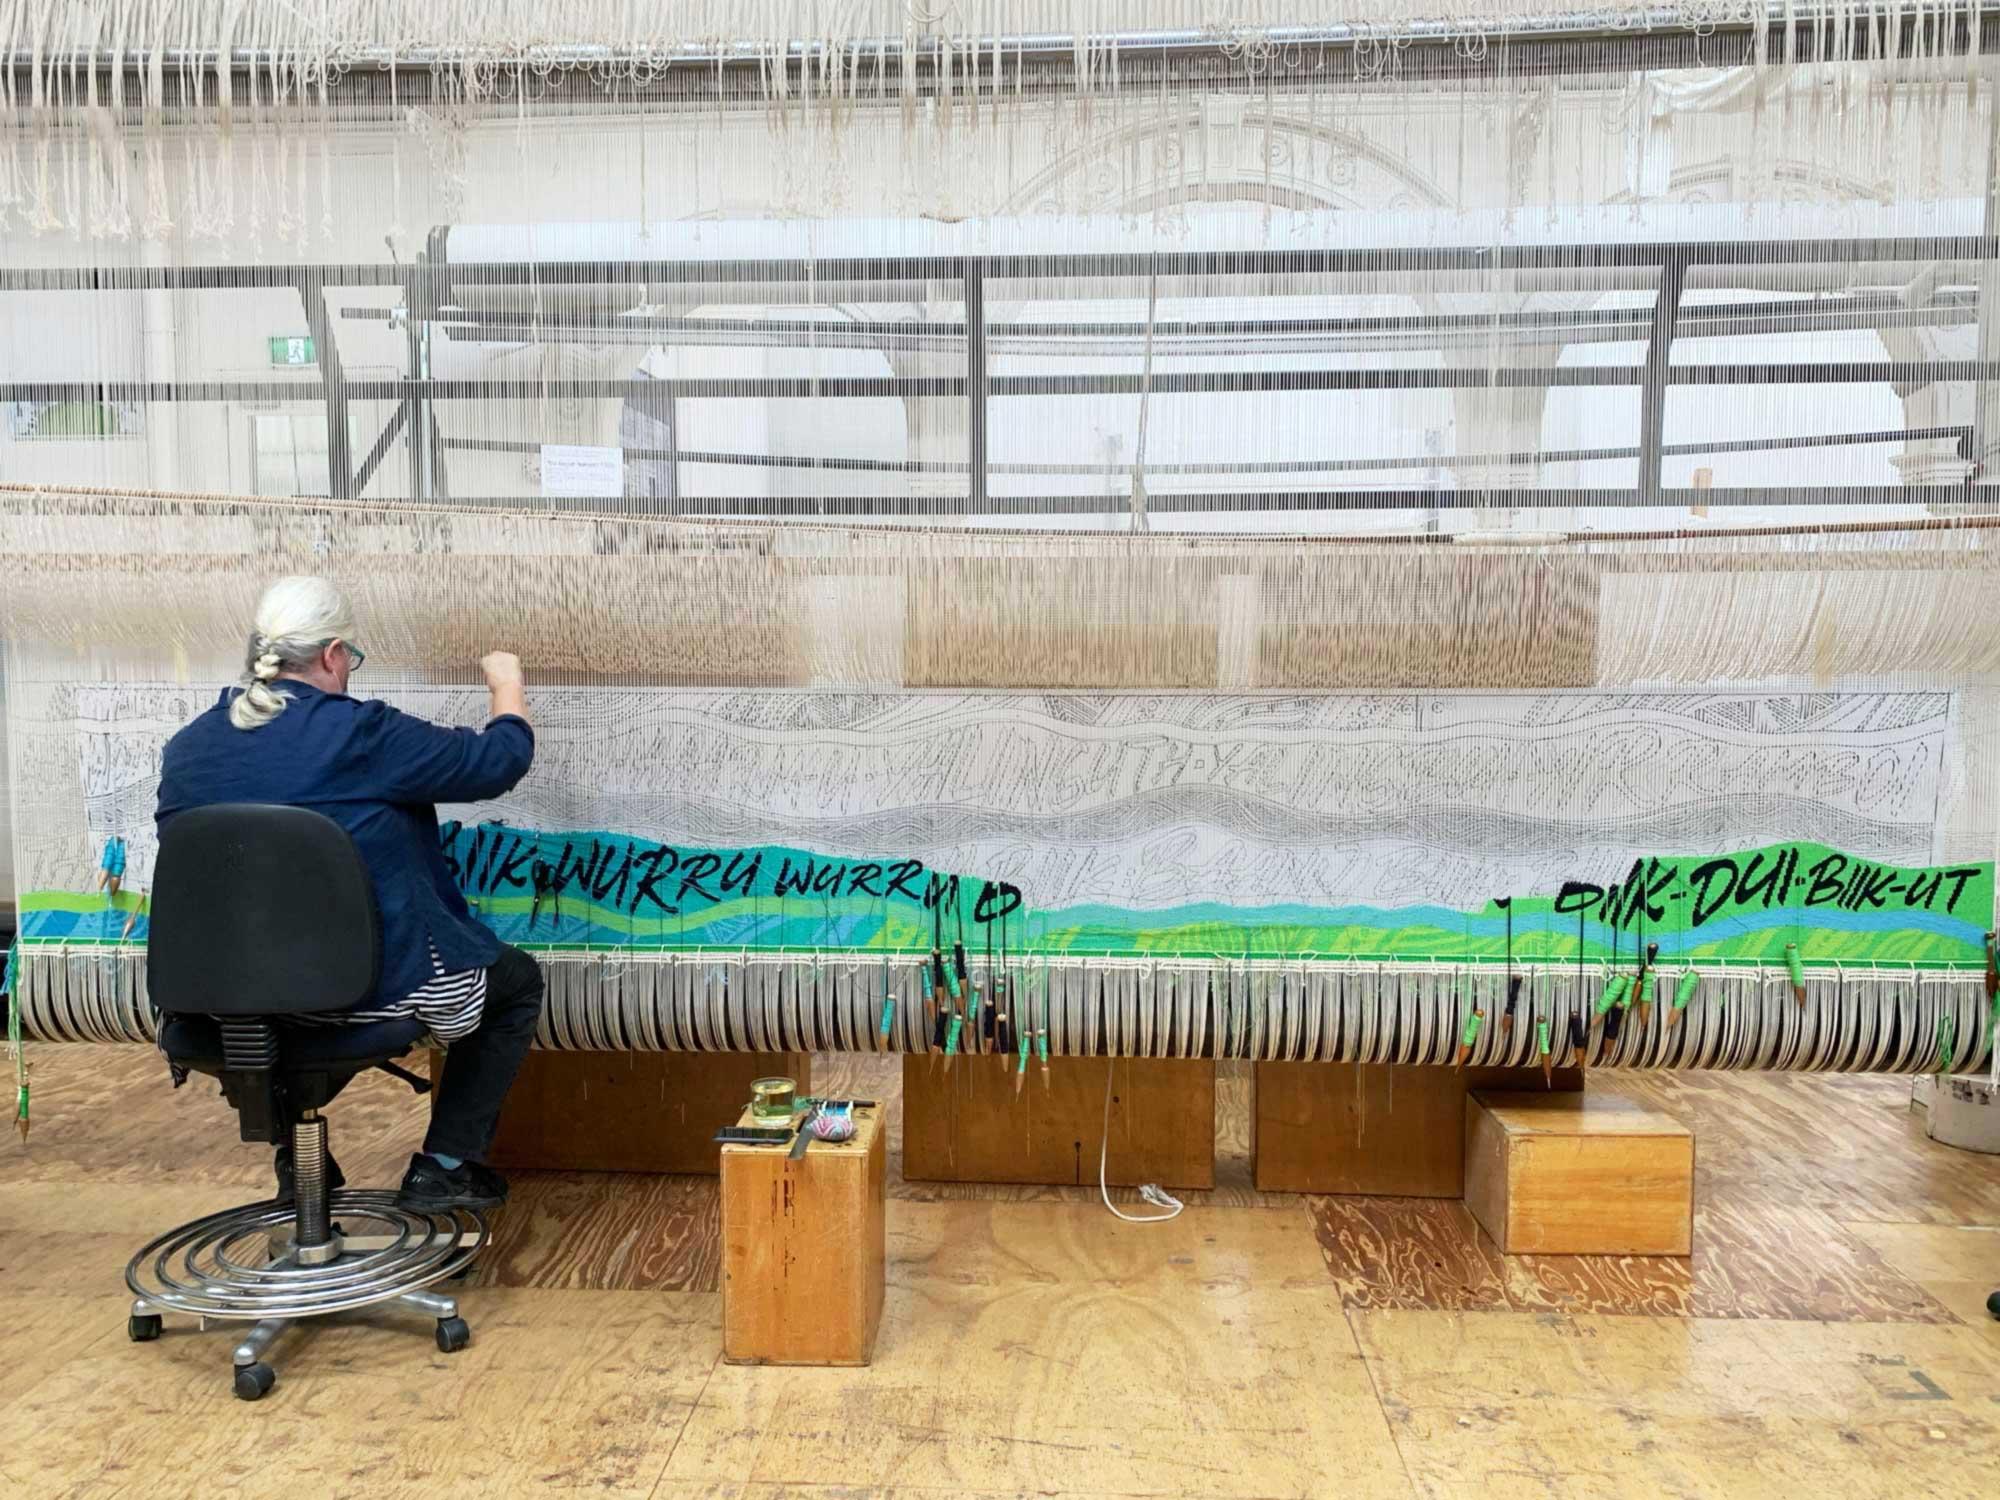 Tapestry in progress: Chris Cochius weaves the 'Wurundjeri Biik, yalinguth, yalingbu, yirramboi' tapestry designed by Mandy Nicholson. Photo ATW.